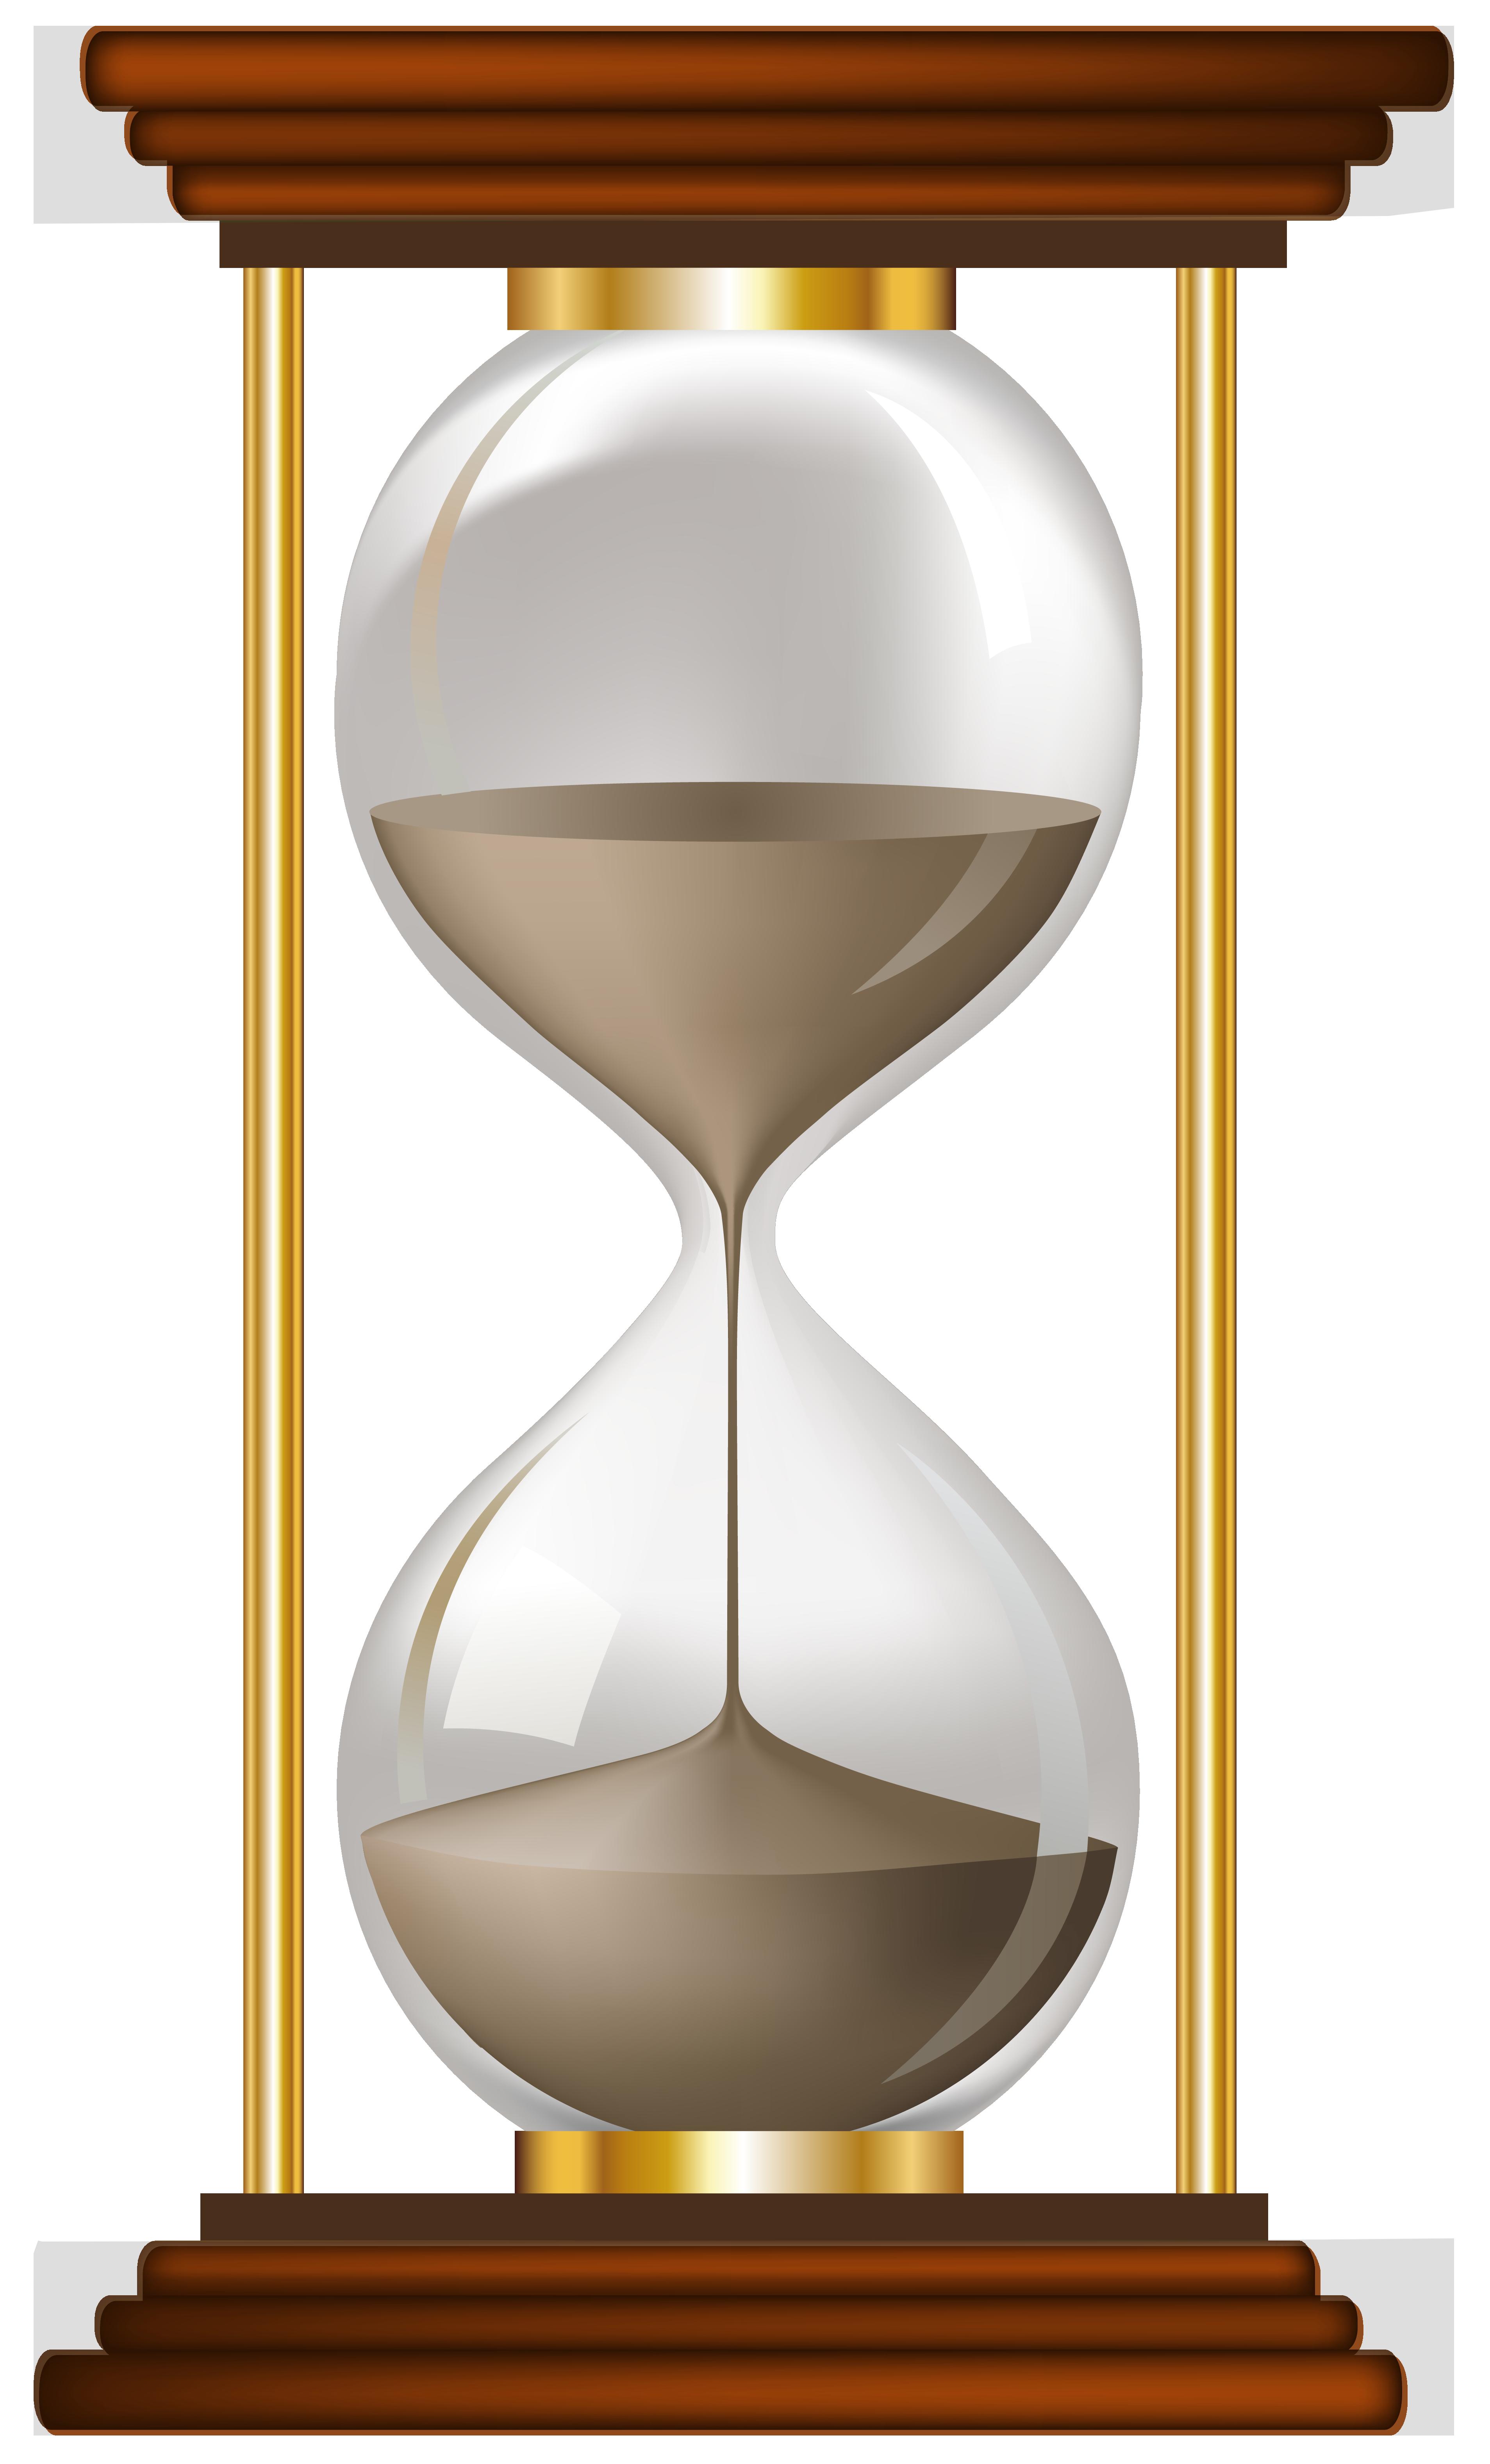 Hourglass clipart sand clock Sand Clock Clip art PNG